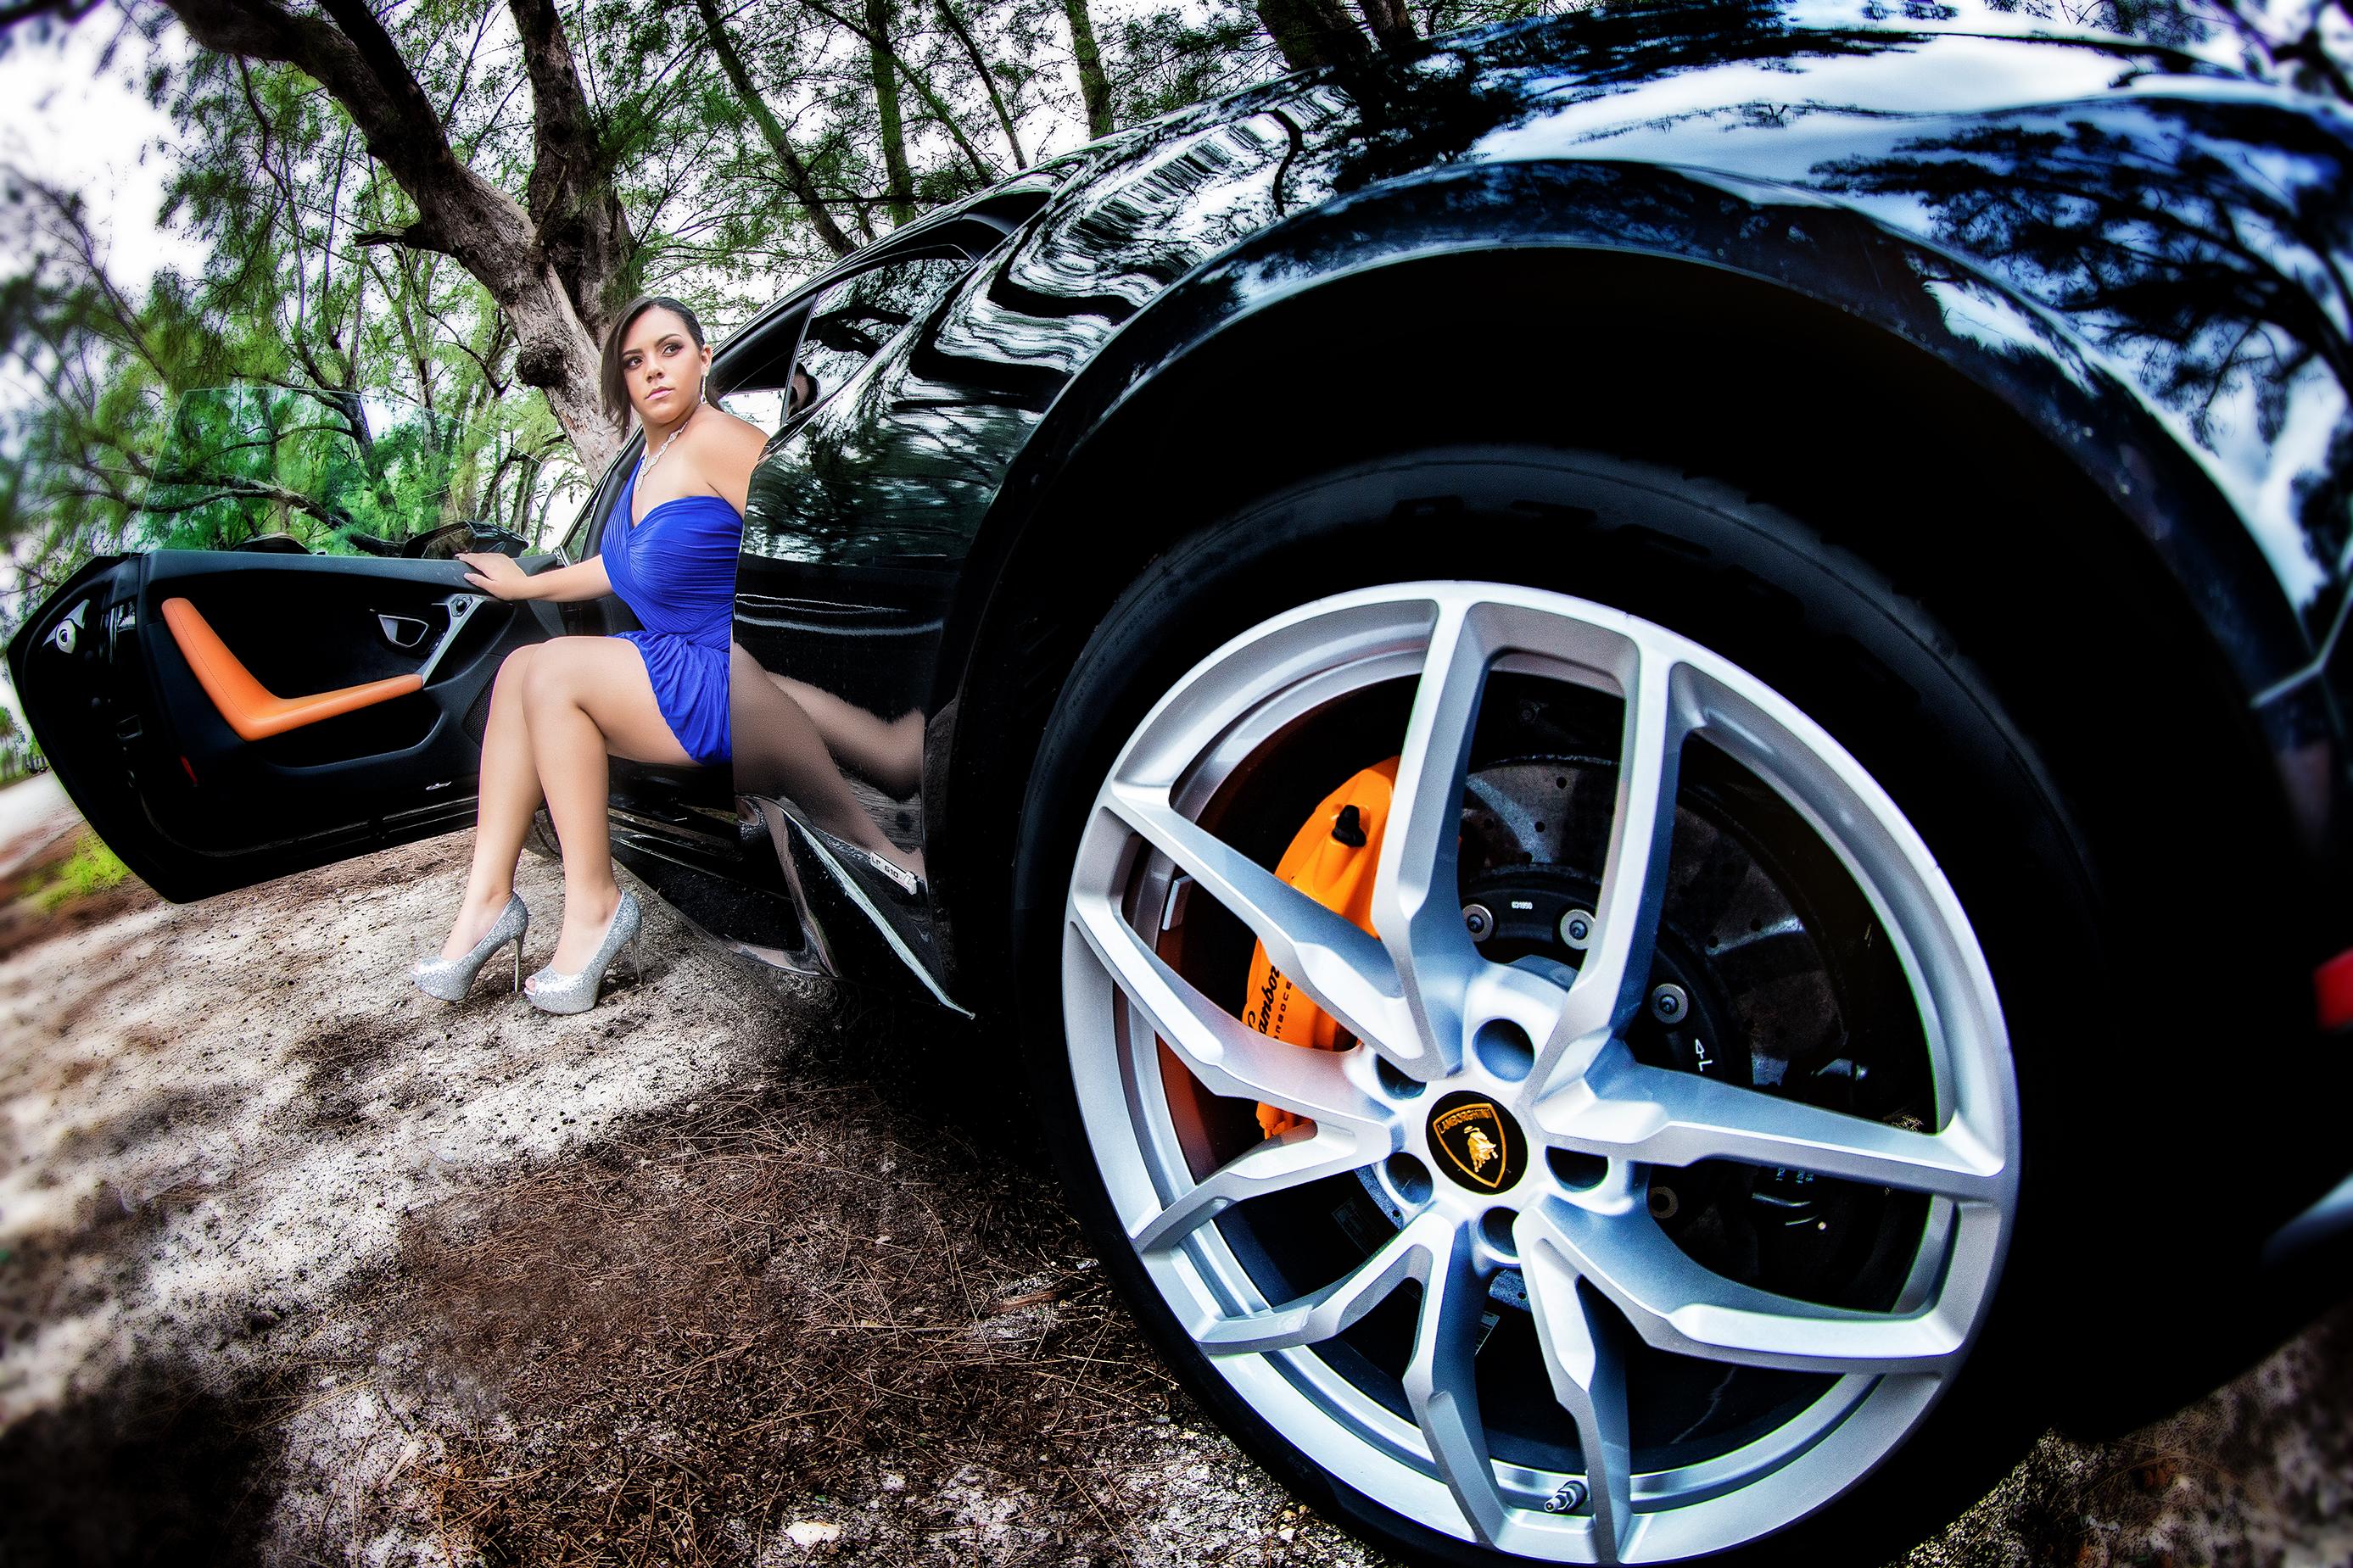 DBatista_Photography_Orlando_Fl_Quinceañera_Miami_Lamborghini_hURACAN-64